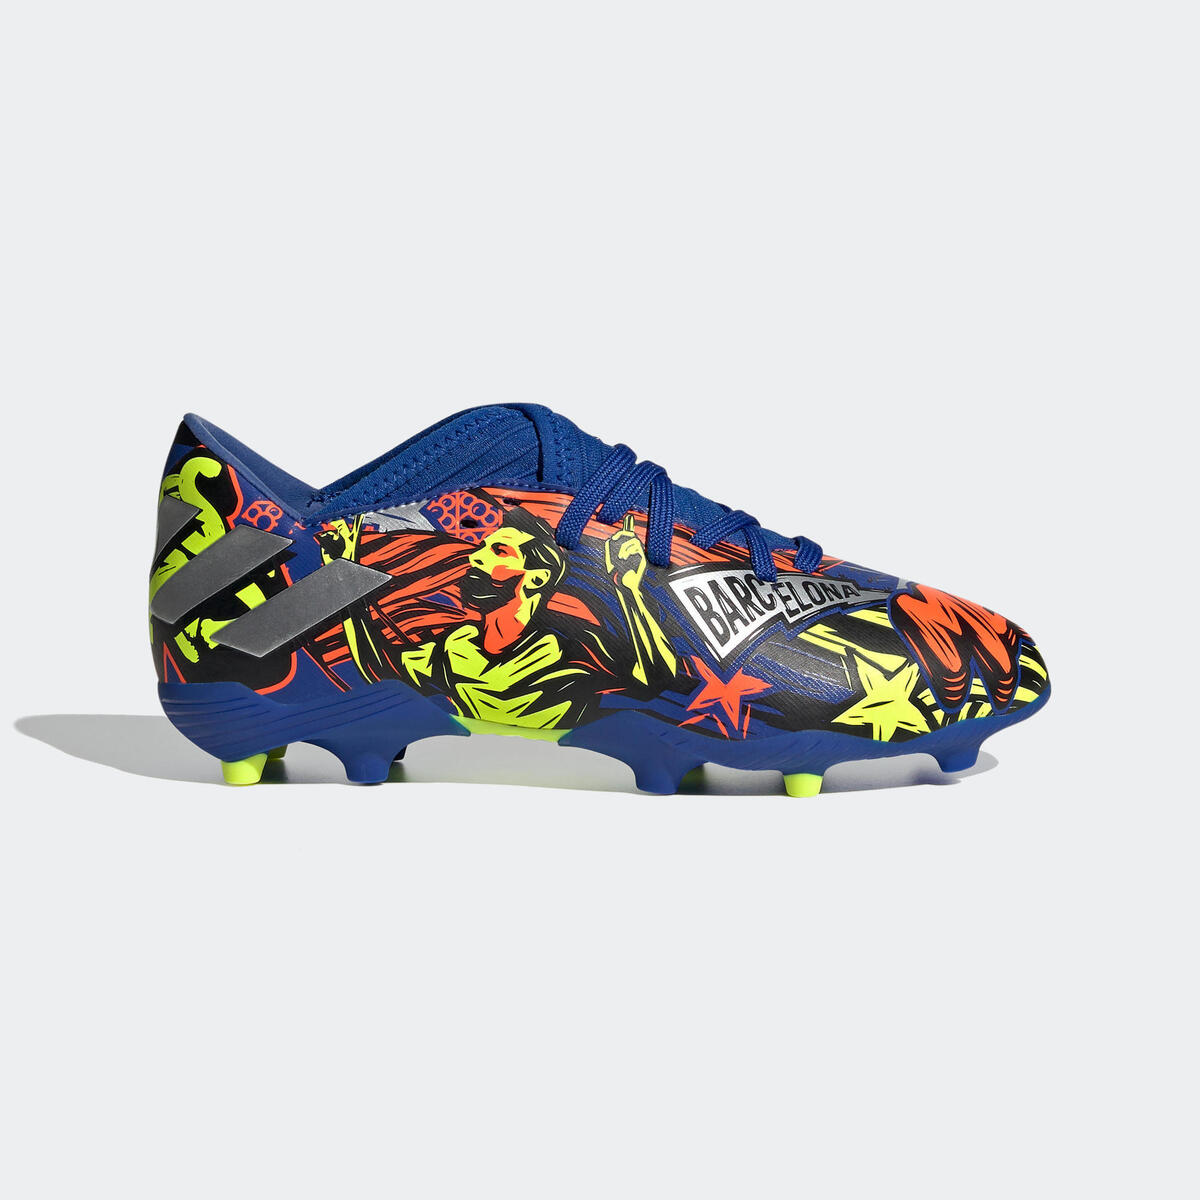 Bild 1 von Fussballschuhe Nocken Nemeziz Messi 19.3 FG Kinder blau